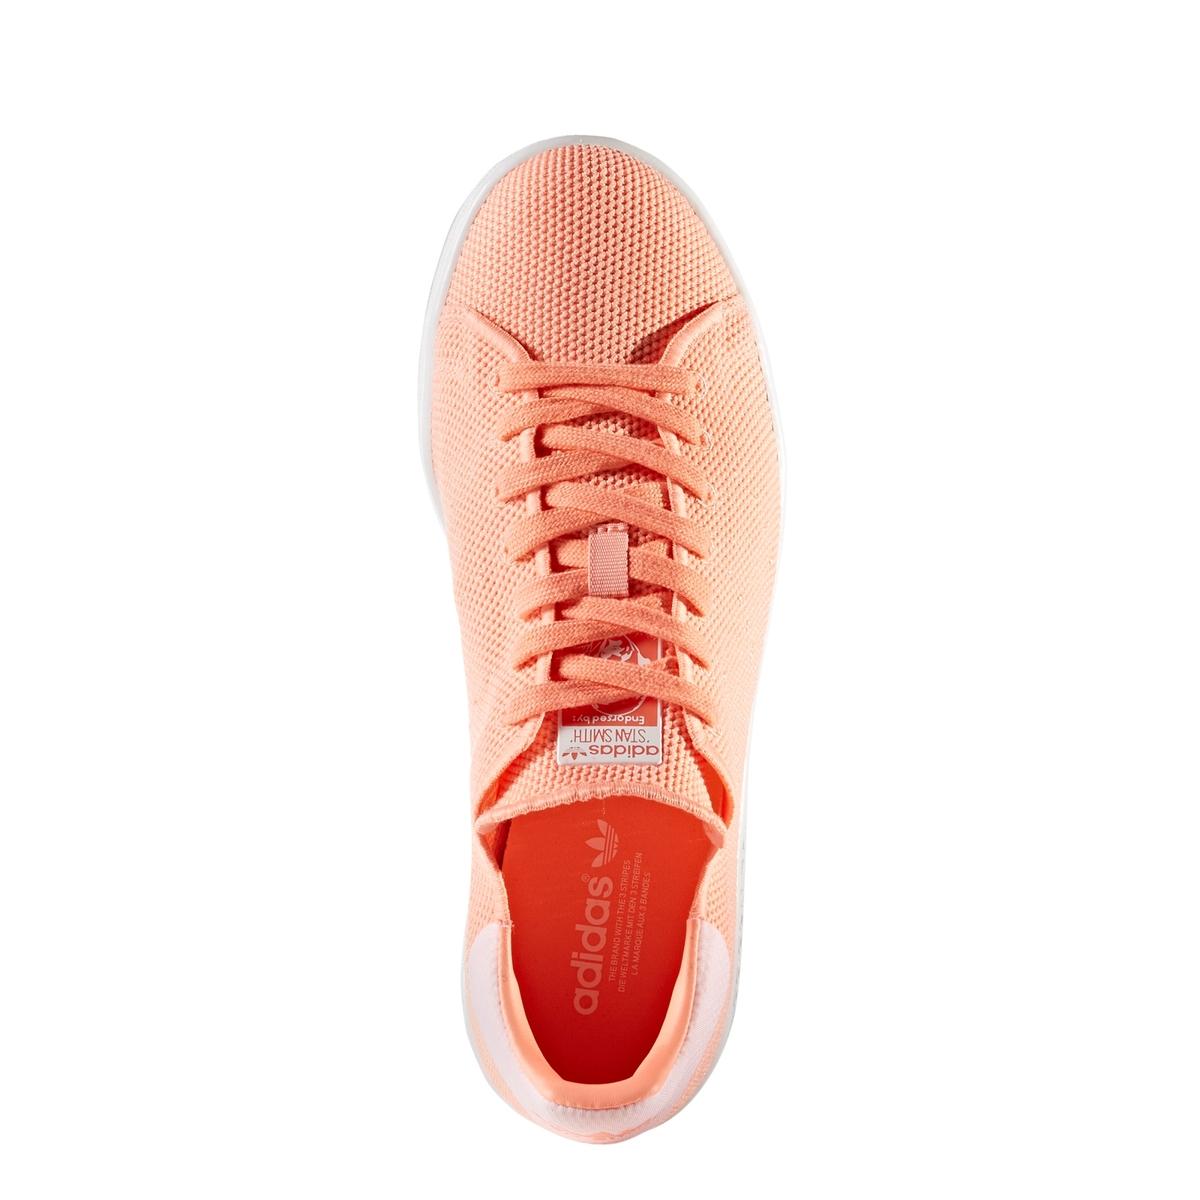 Imagen secundaria de producto de Zapatillas Stan Smith - Adidas